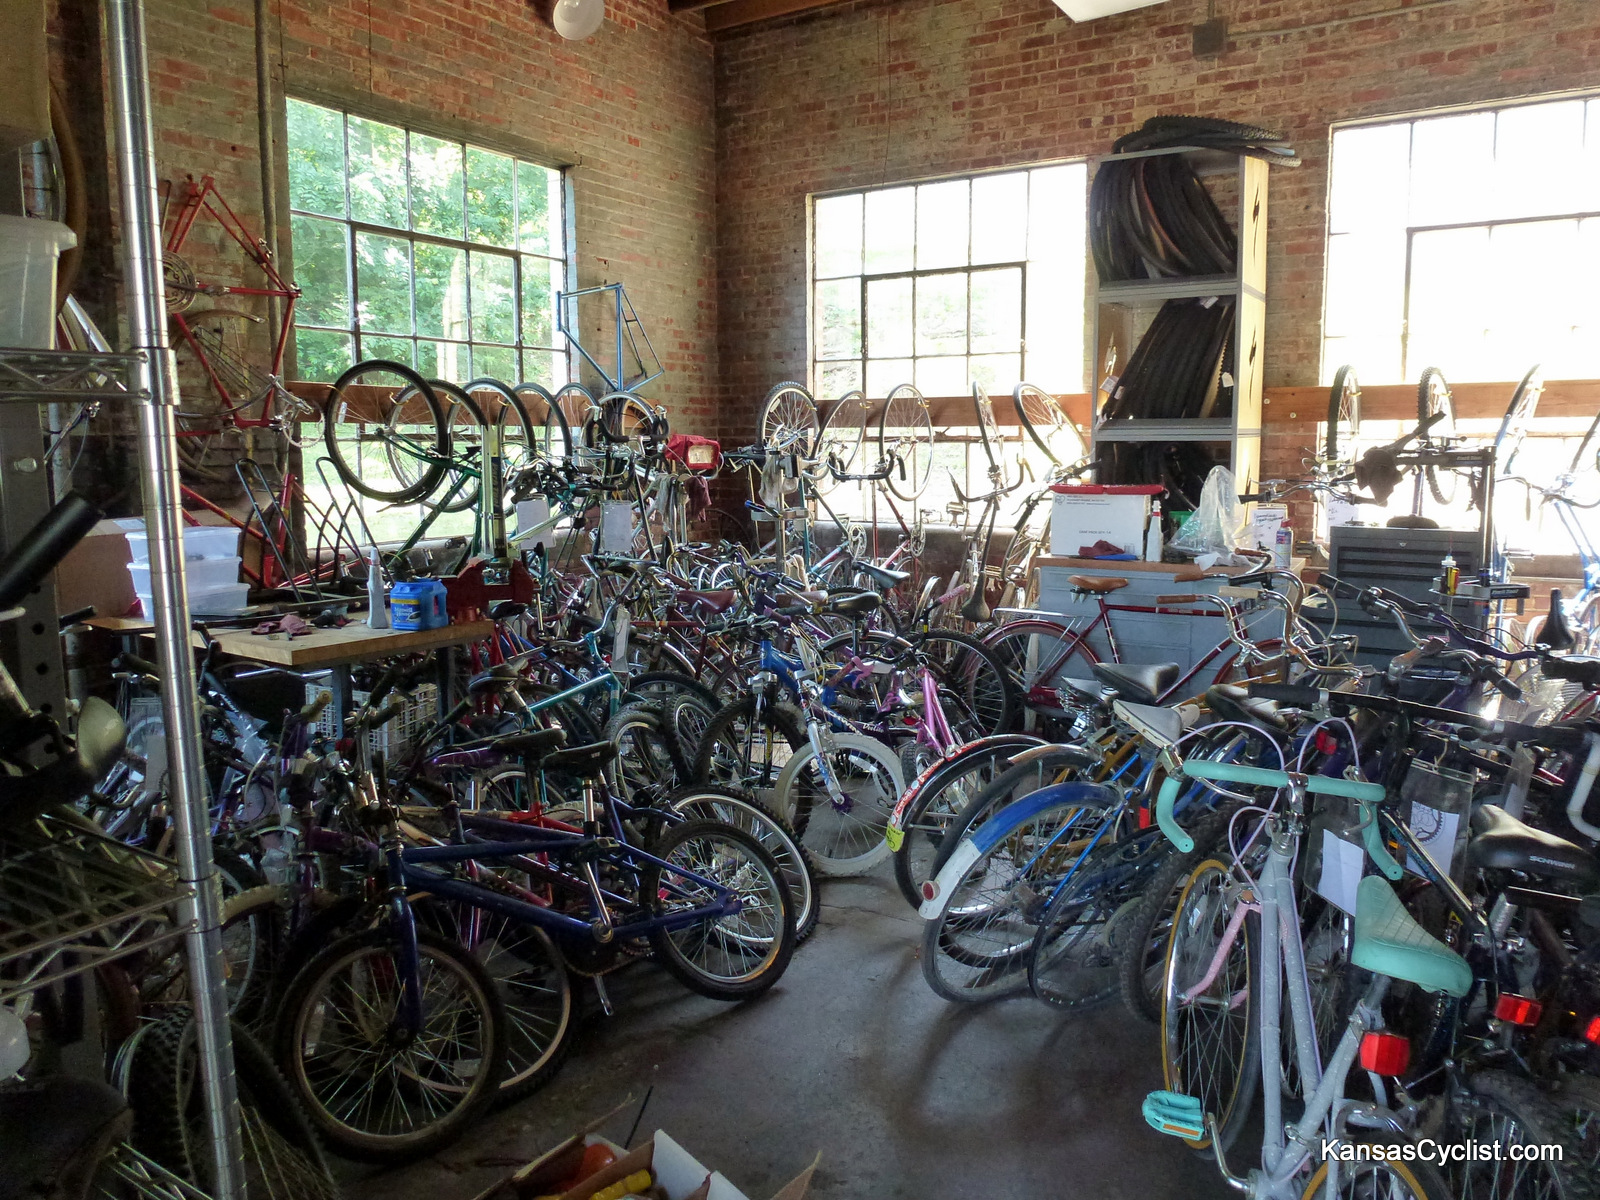 30DaysOfBiking 2012: Earn-A-Bike | Kansas Cyclist News